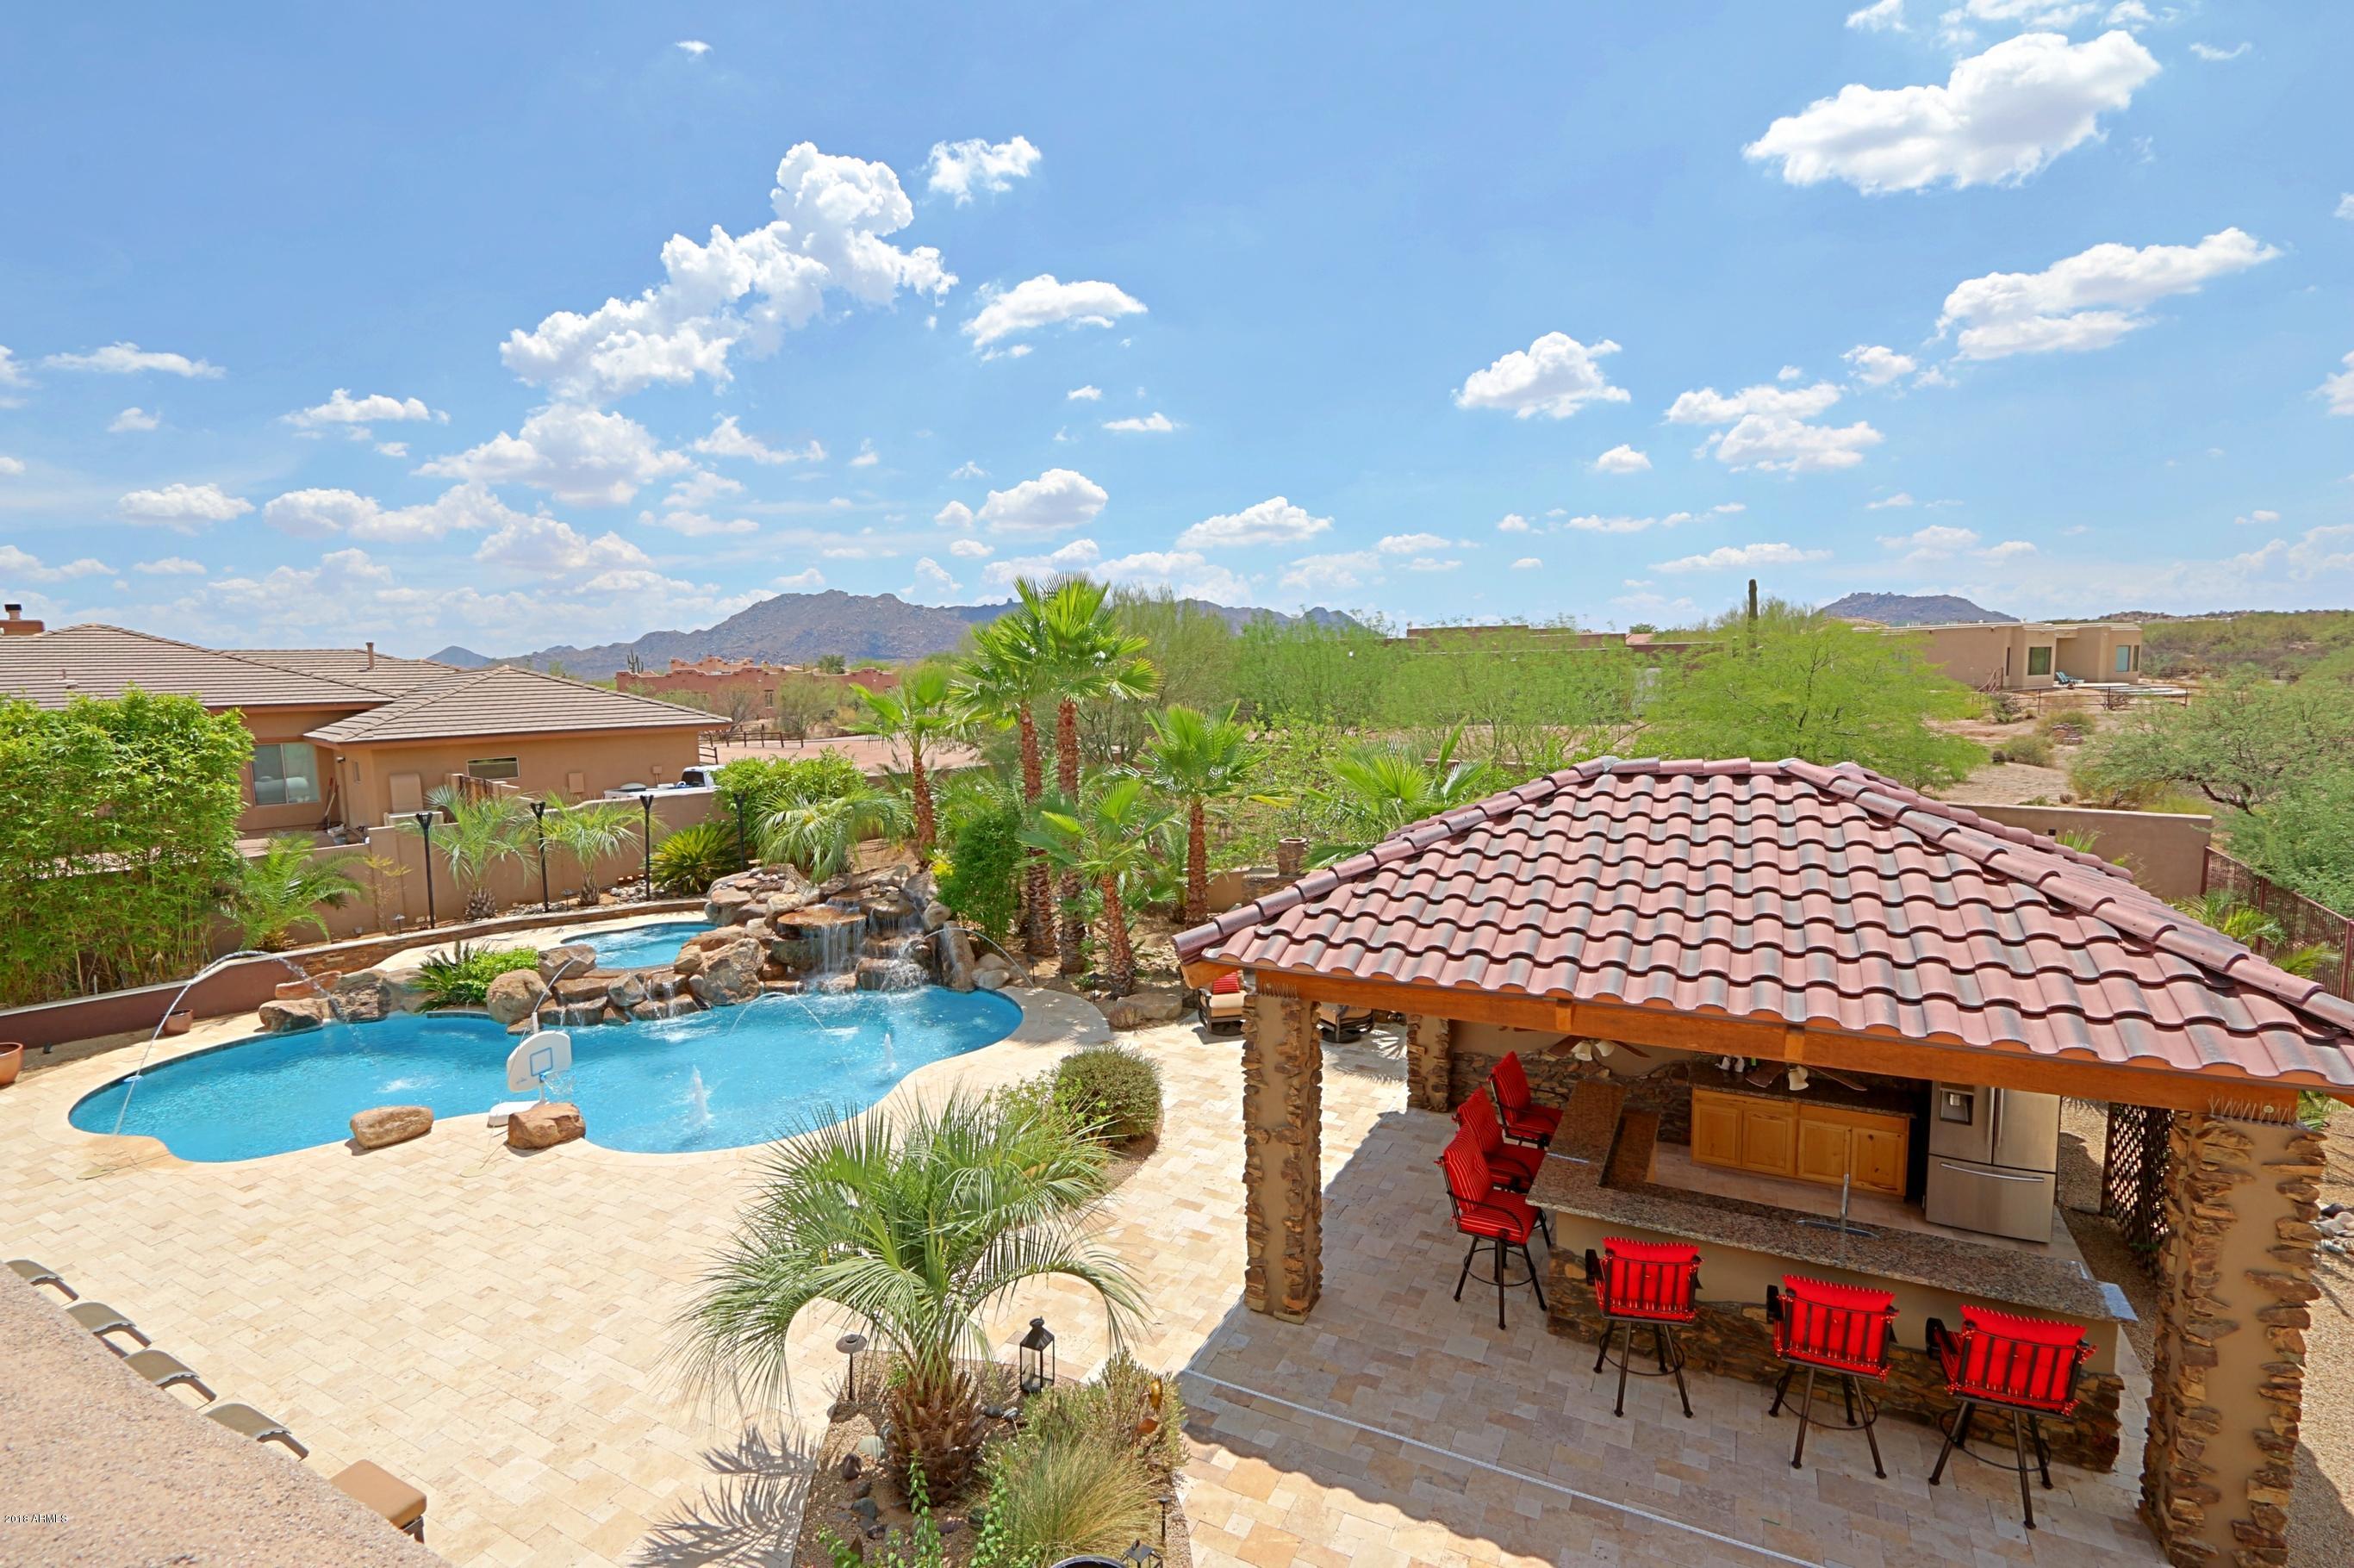 MLS 5795373 26818 N 144TH Street, Scottsdale, AZ 85262 Scottsdale AZ Metes And Bounds